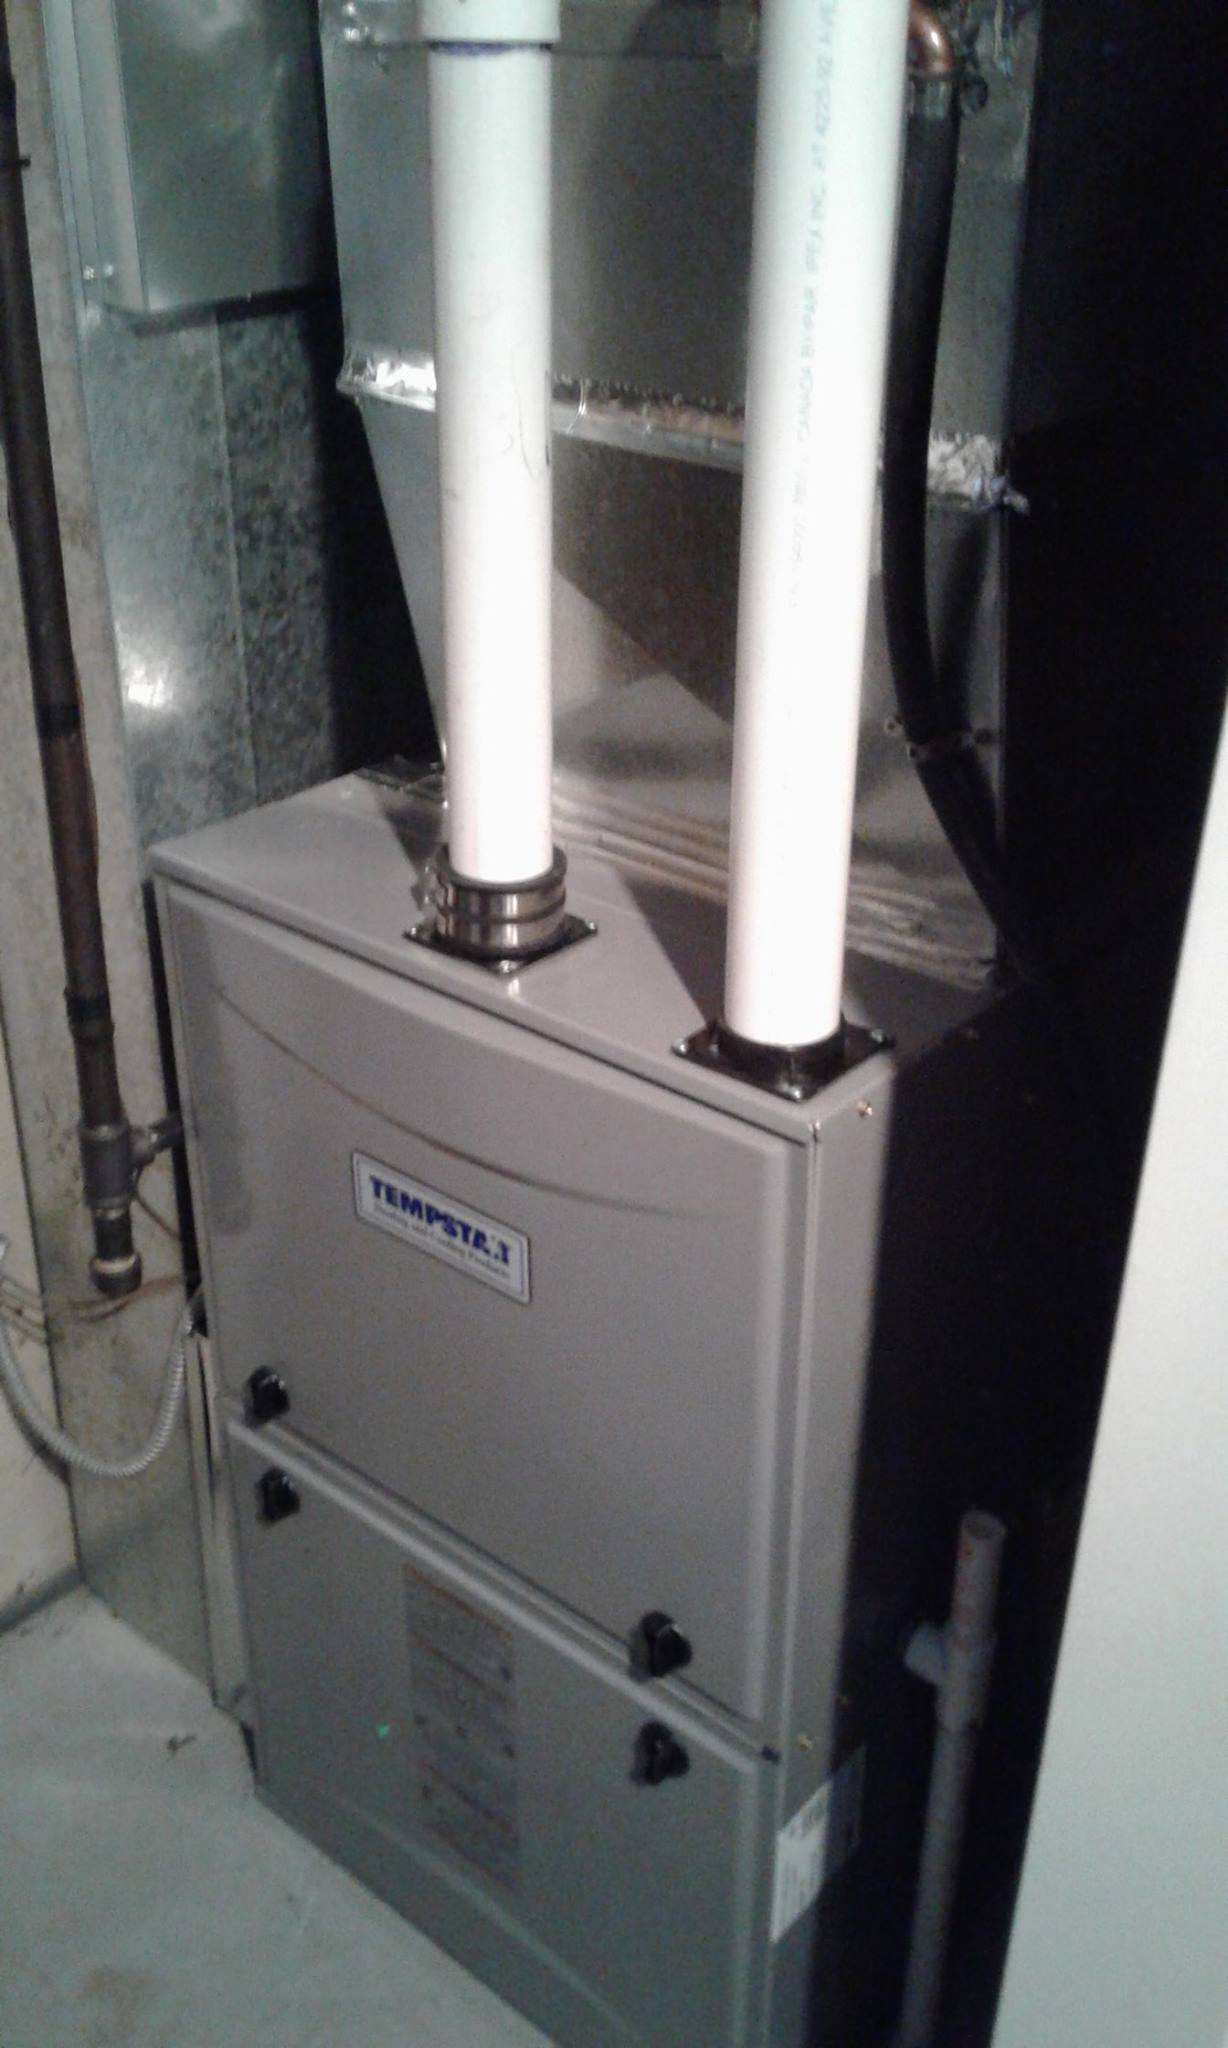 American Standard Furnace Thermocouple : Furnace phillip s plumbing and heating kelowna bc